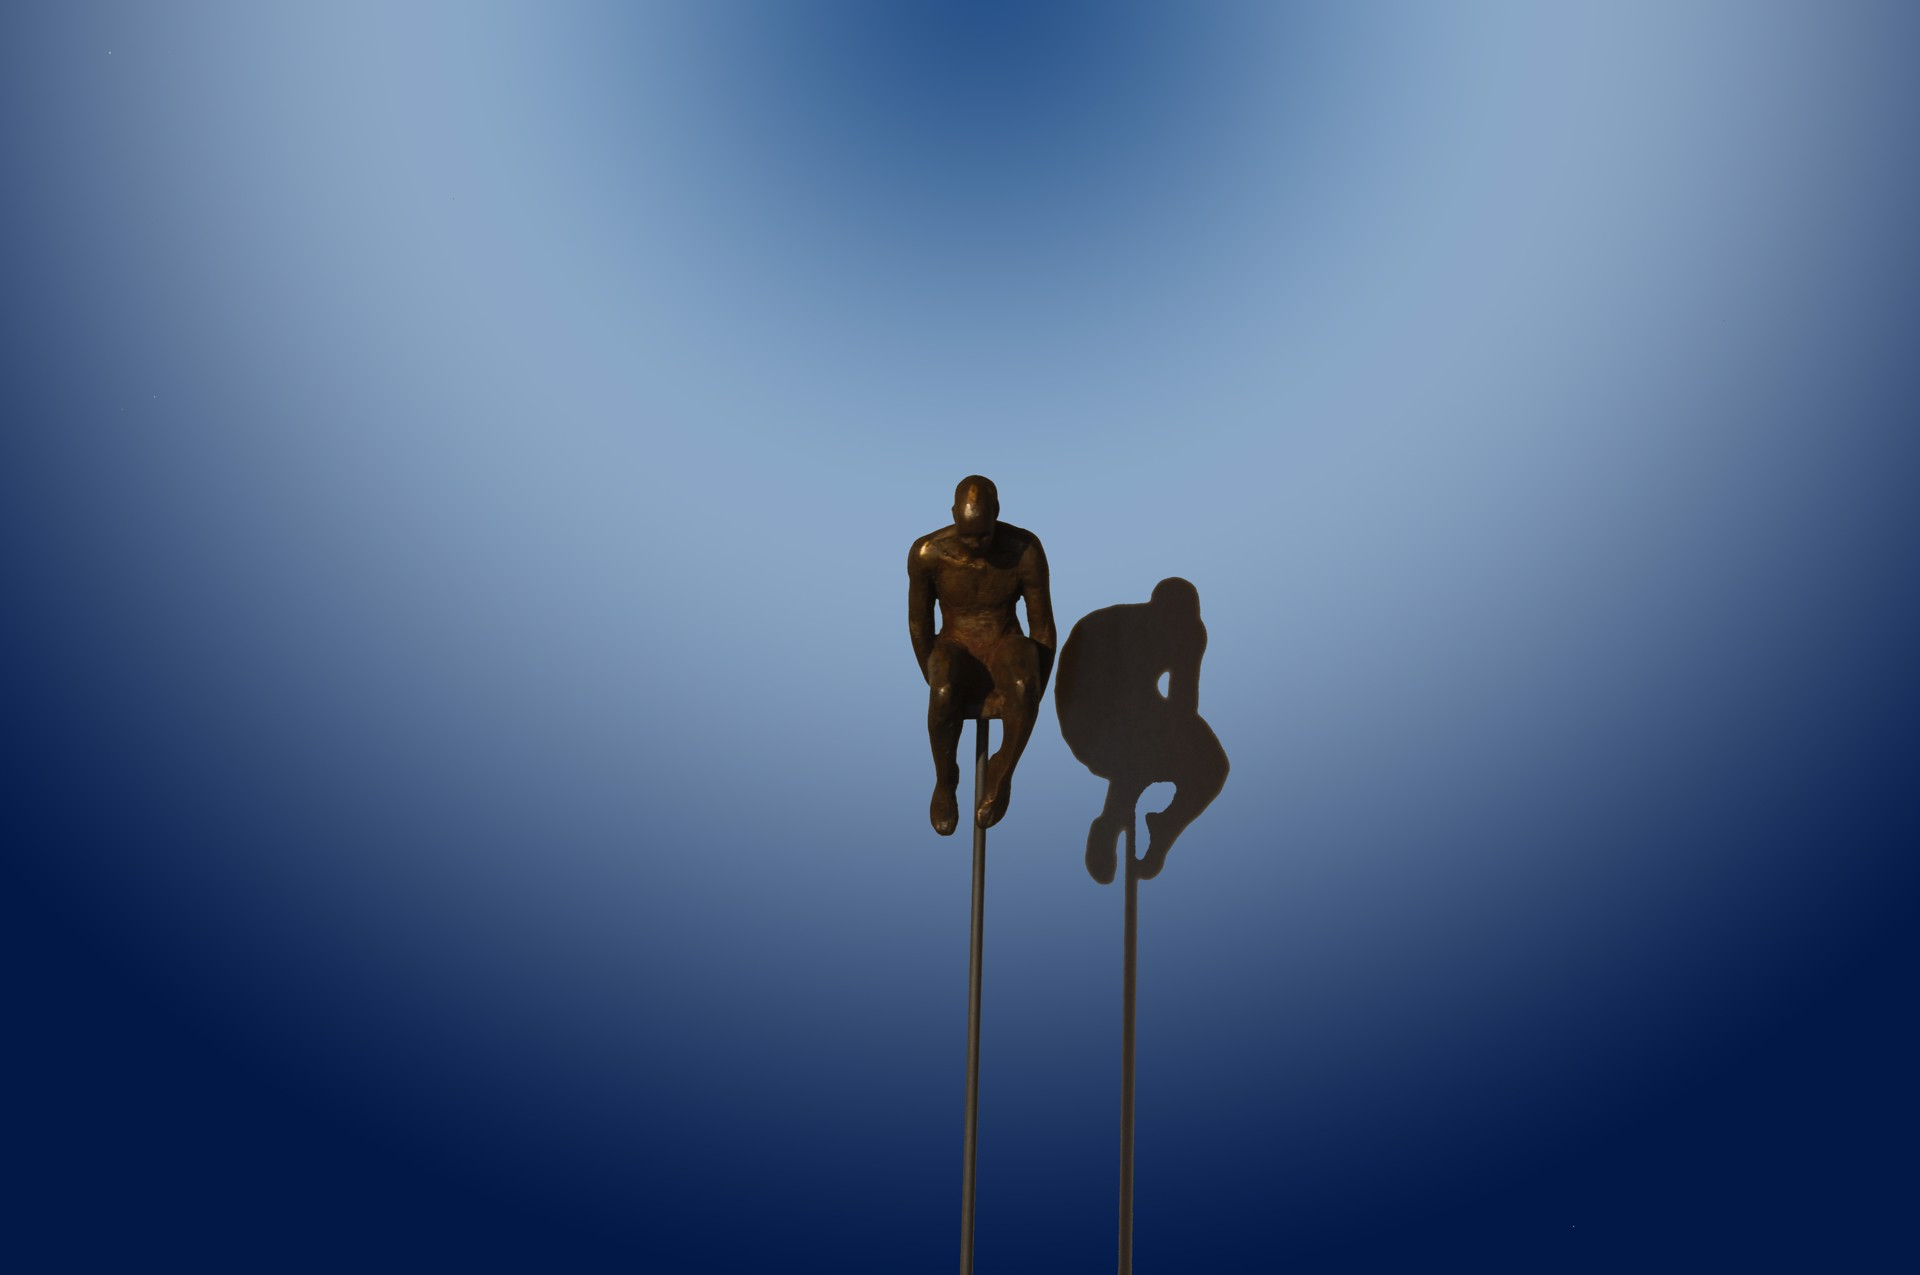 Balance Series: Polesitter by Bill Starke